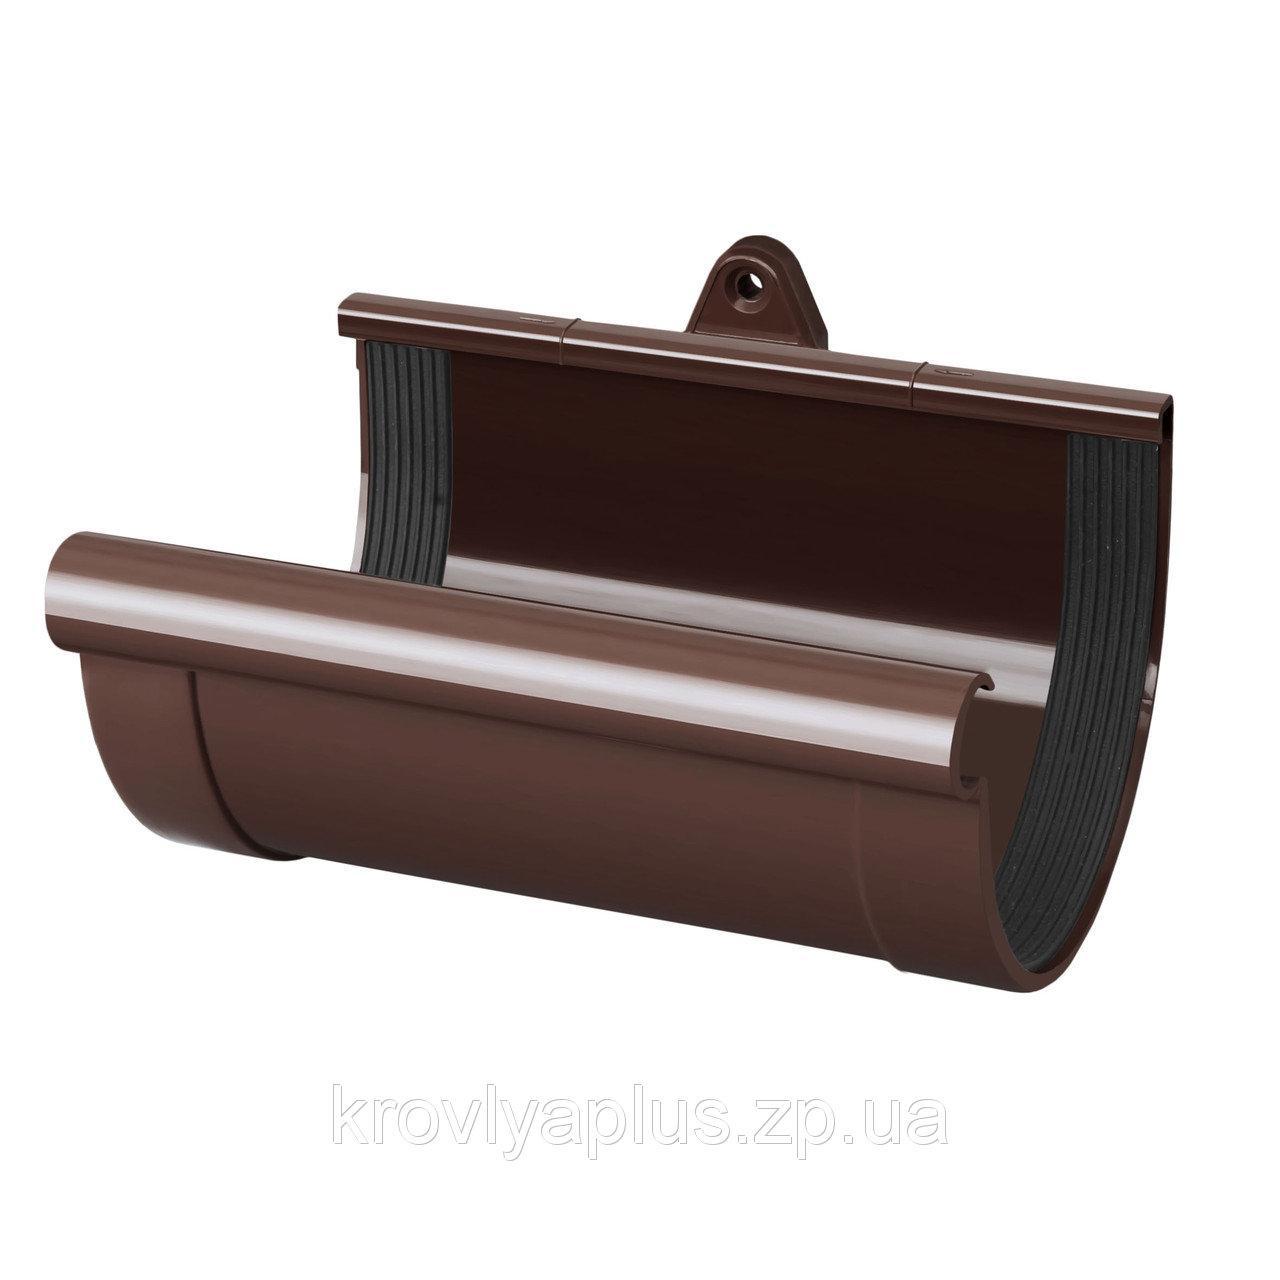 Муфта желоба RainWay 130 мм коричневый